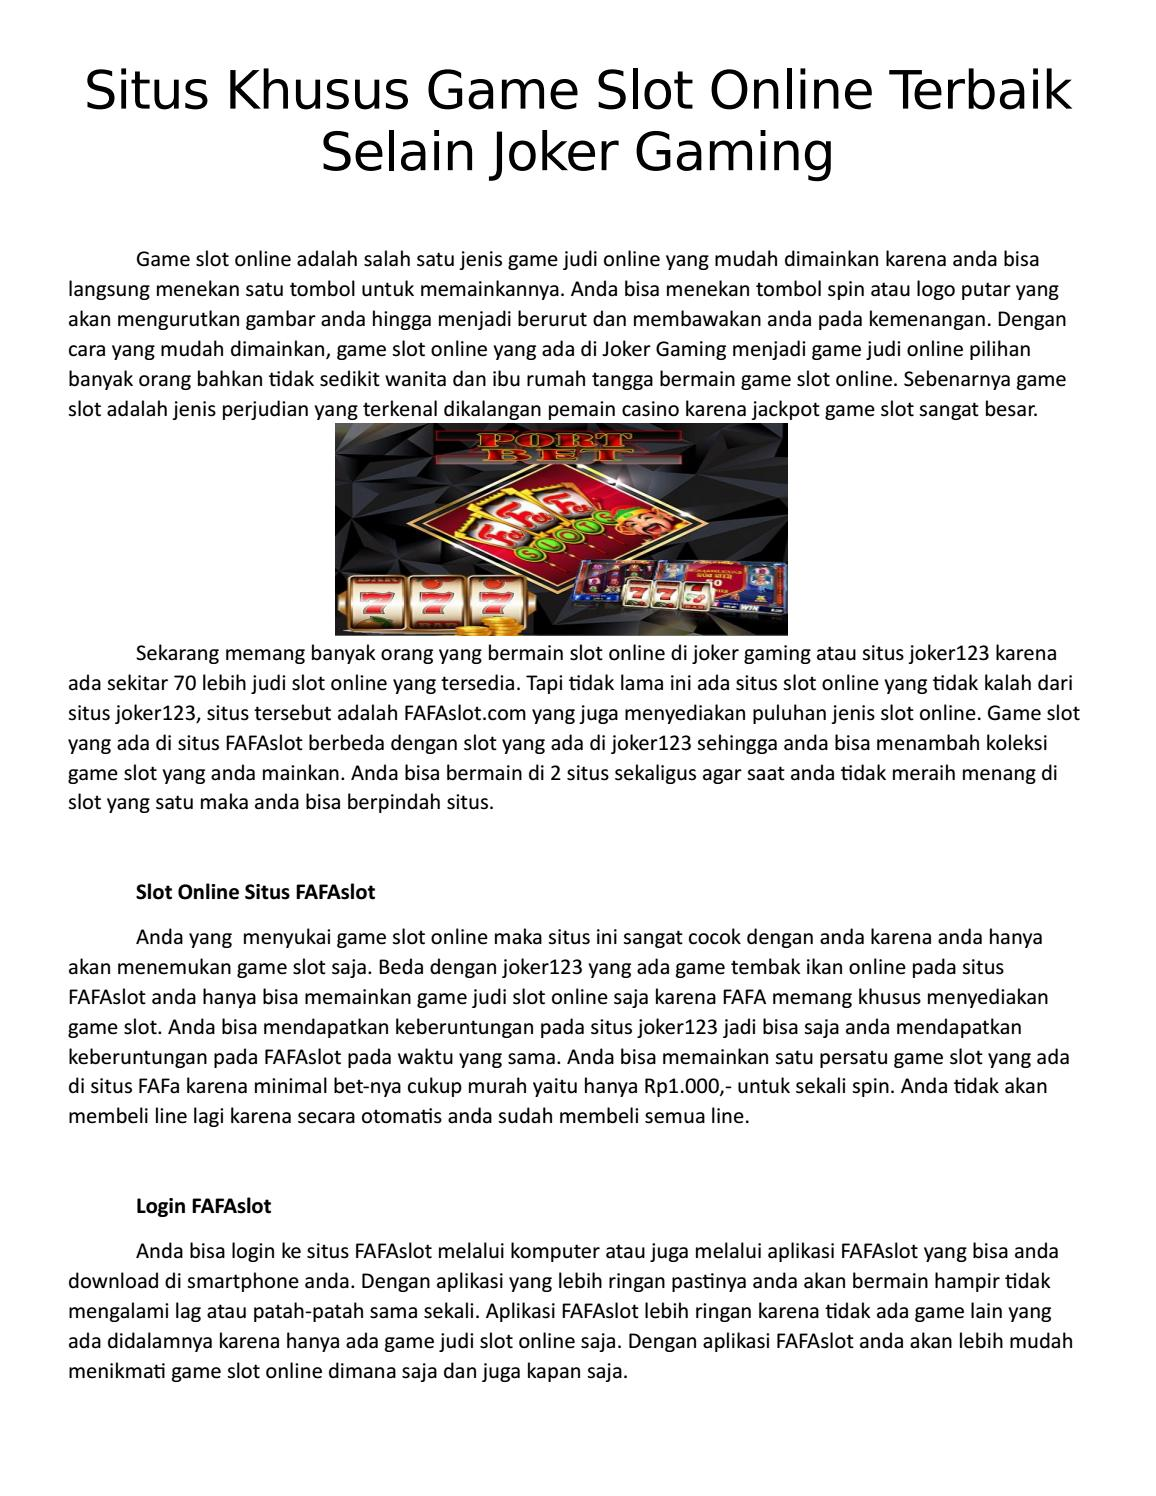 Situs Slot Paling Tekemuka Di Masa Kini Joker123 Fafaslot Habanero By Mayat Malam303 Issuu